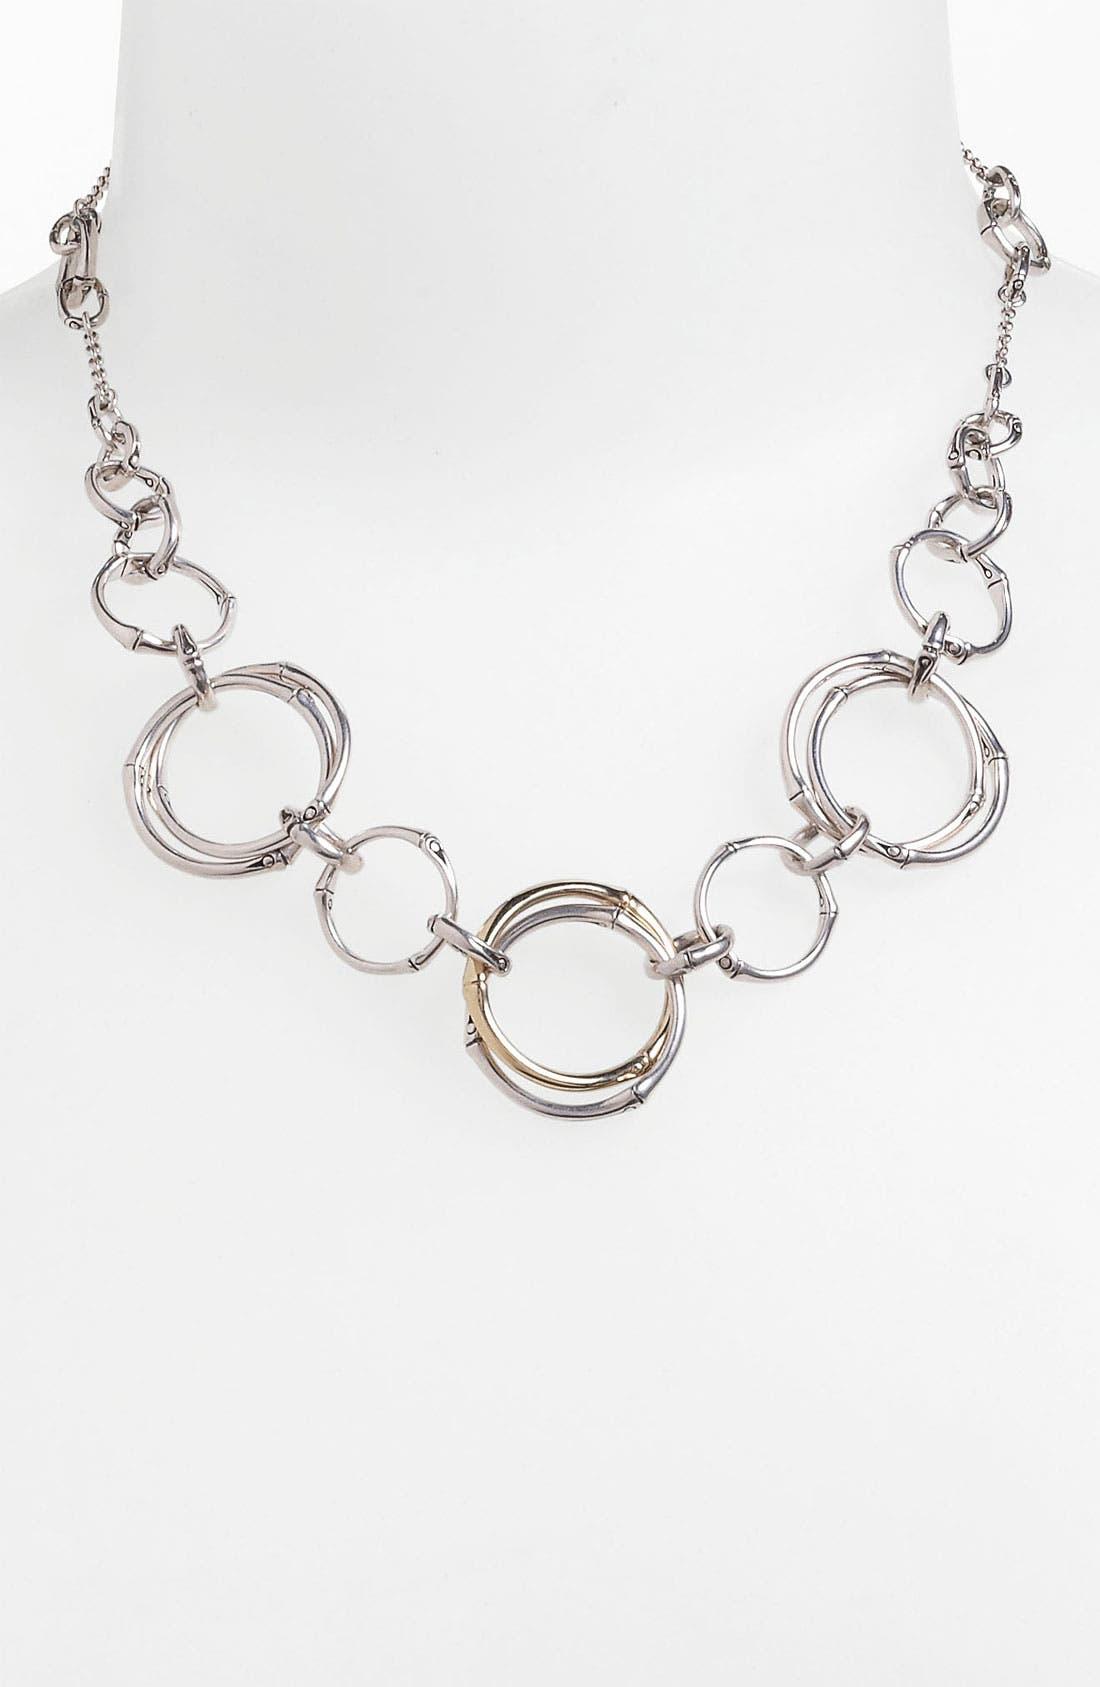 Main Image - John Hardy 'Bamboo' Frontal Necklace